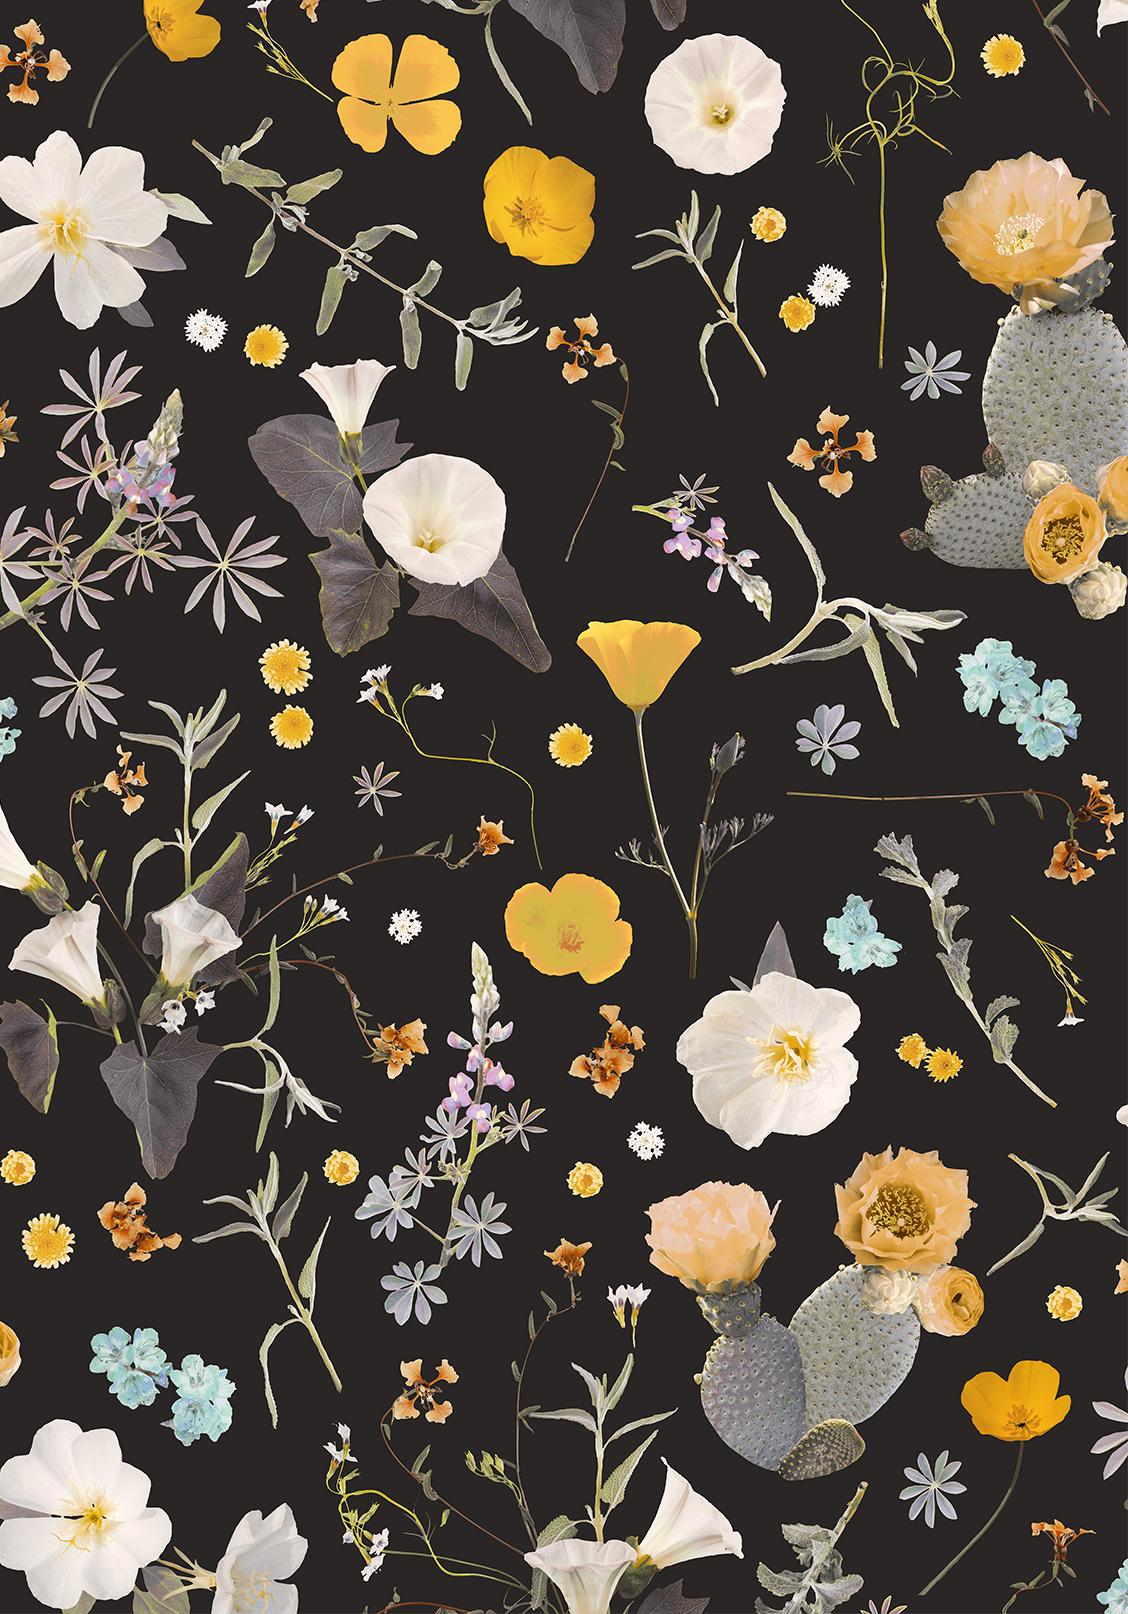 California Native Removable Fabric Wallpaper Peel And Stick Samantha Santana